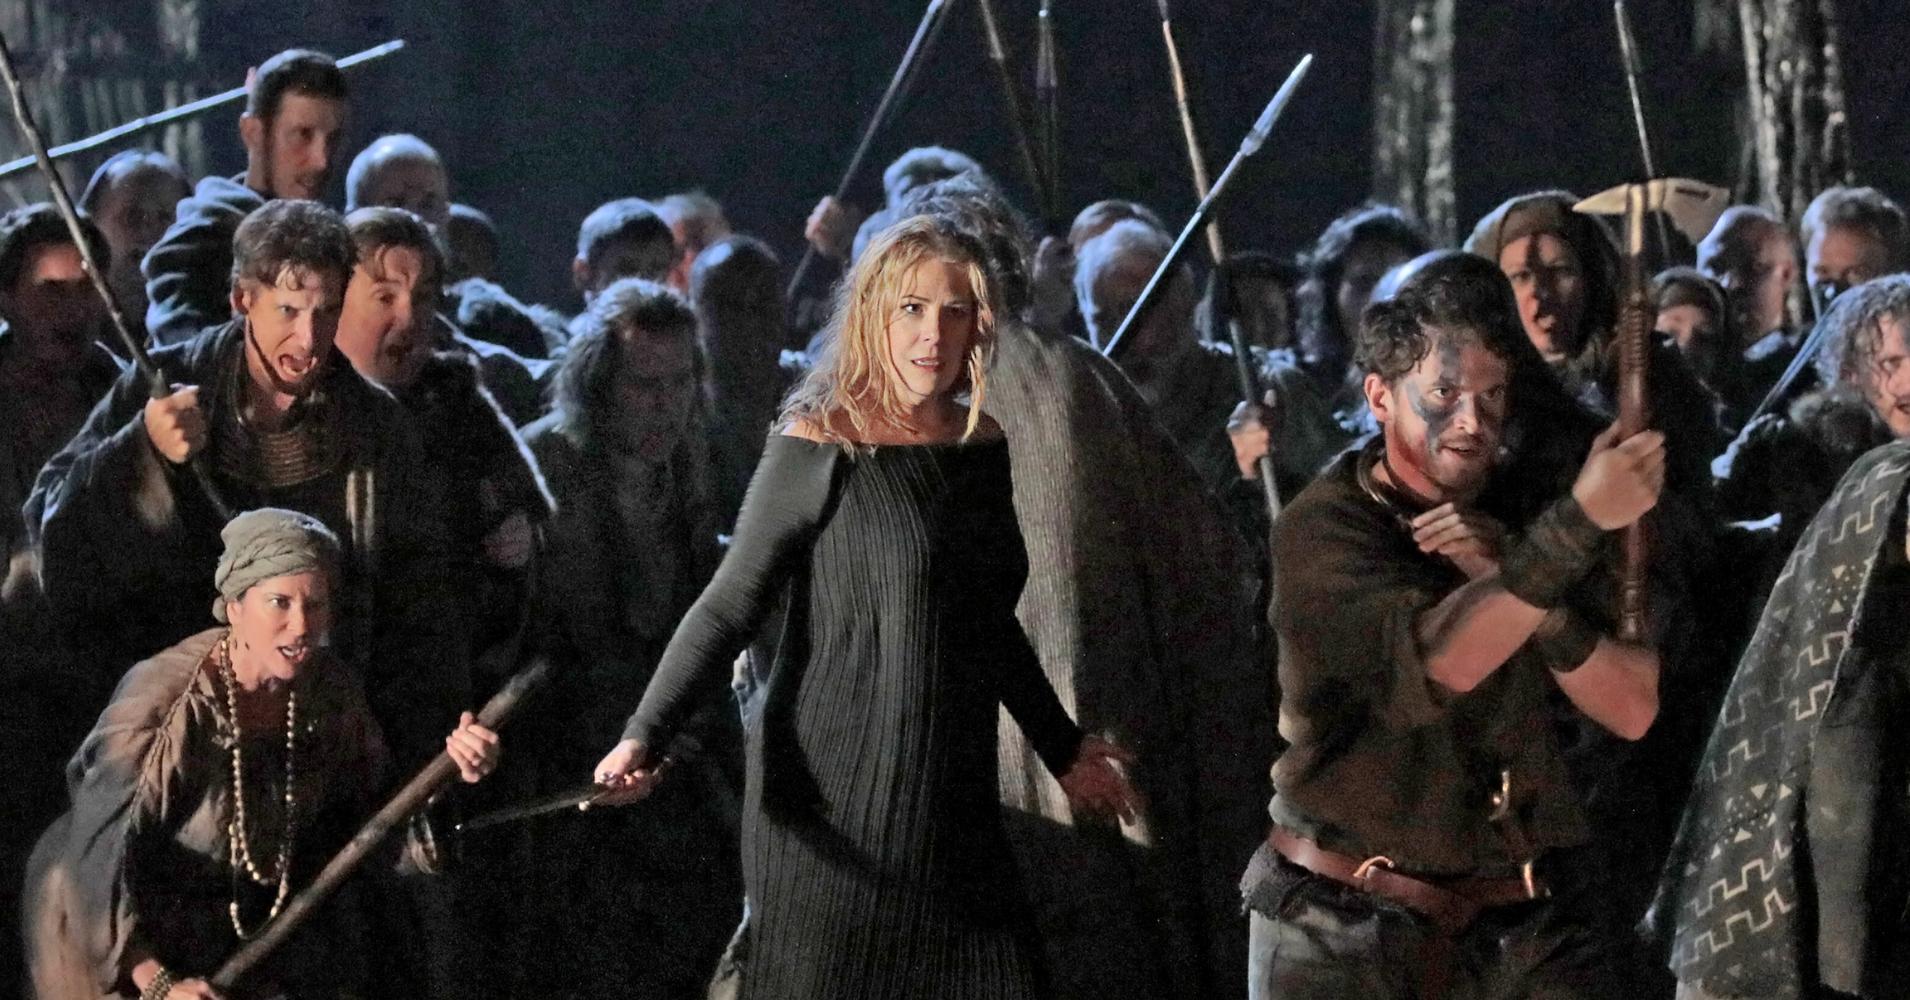 Met Opera Season to Showcase Radvanovsky, Yoncheva, McVicar